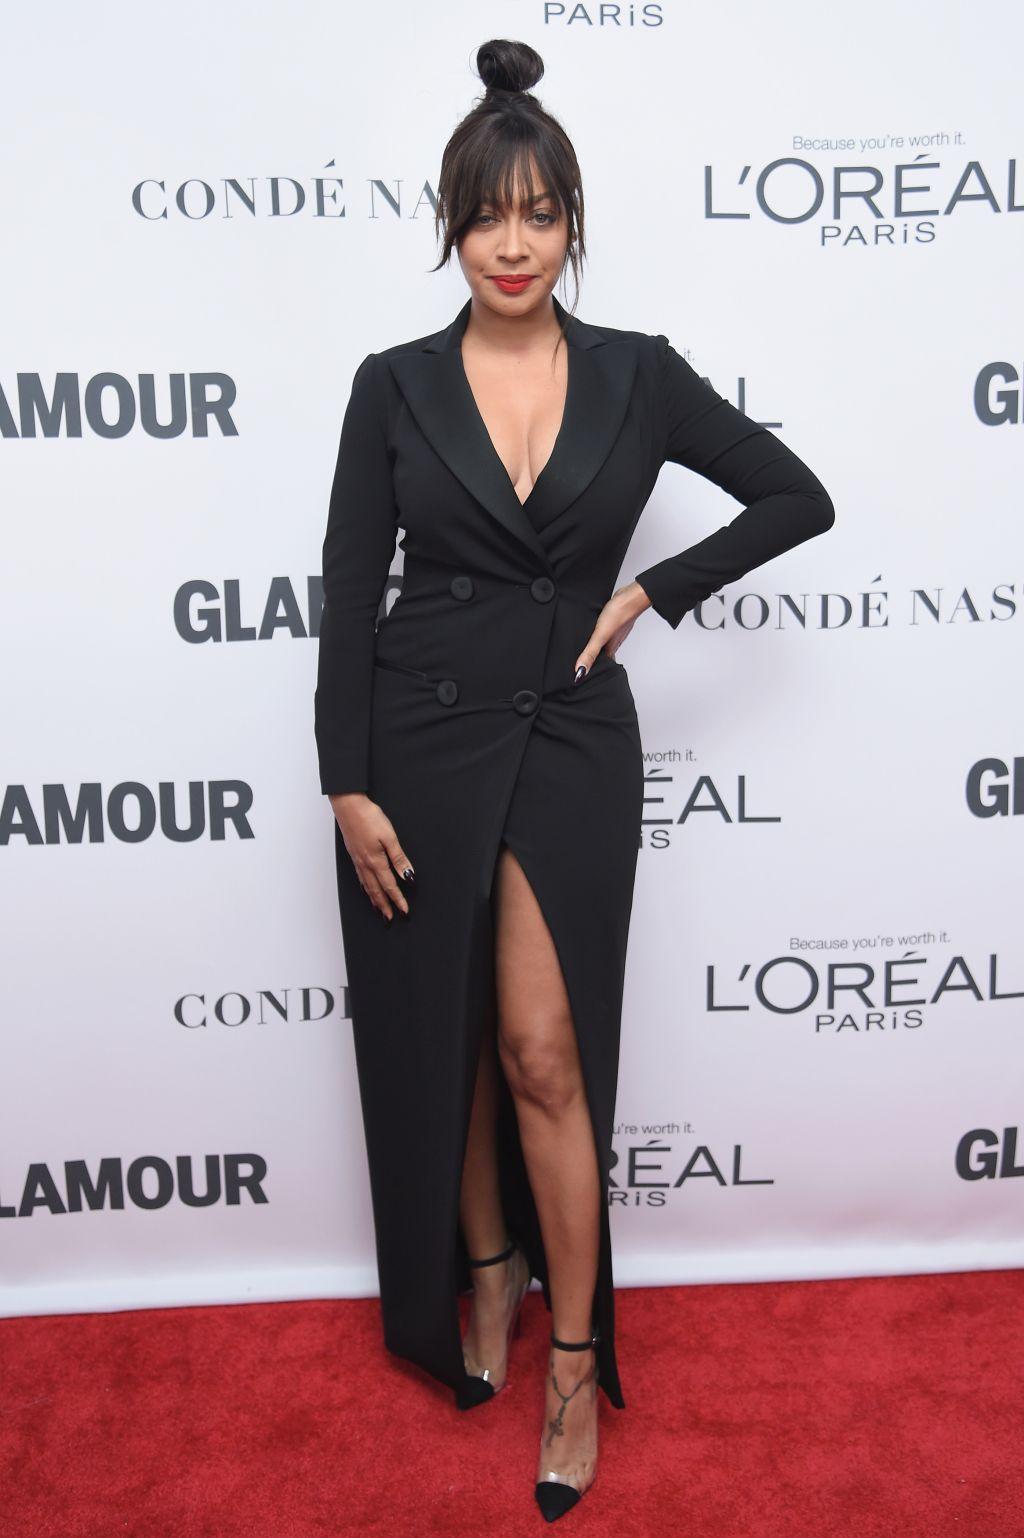 Glamour Celebrates 2017 Women Of The Year Awards - Arrivals